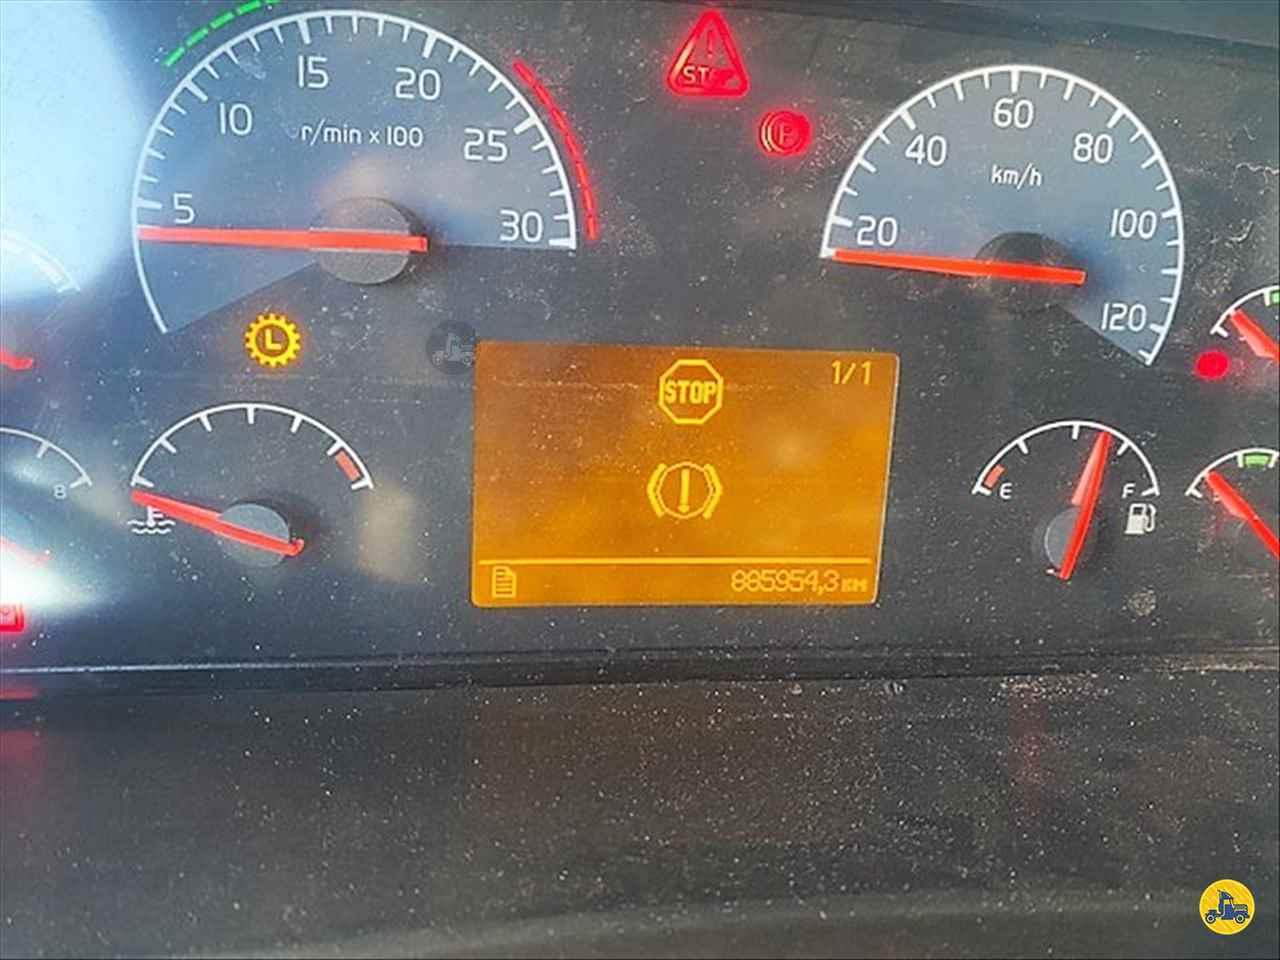 VOLVO VOLVO FH 440 850000km 2008/2009 BOIKO Transportes e Logistica Eireli